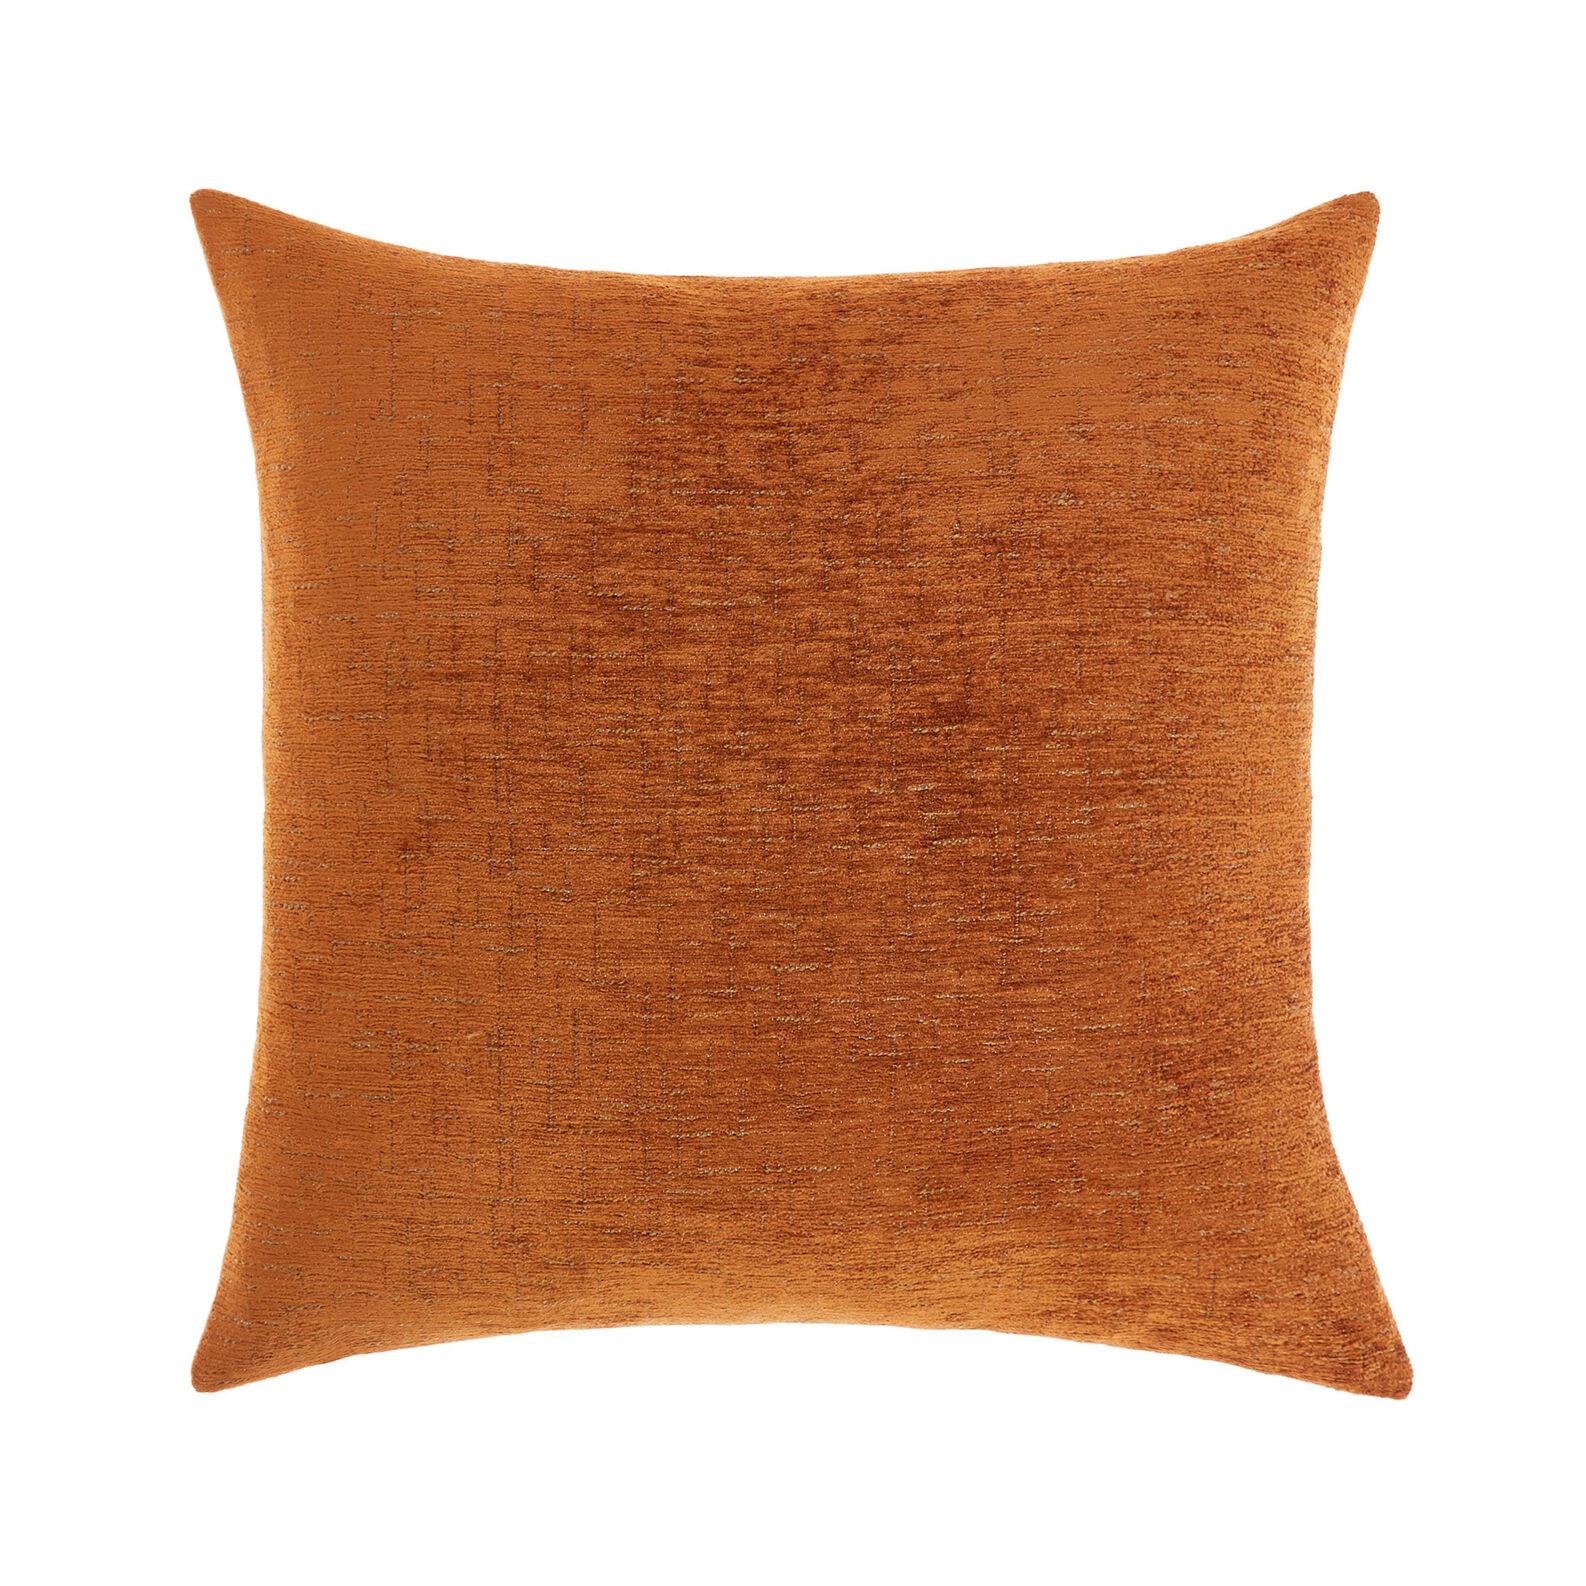 Velvet cushion with vintage effect 45x45cm